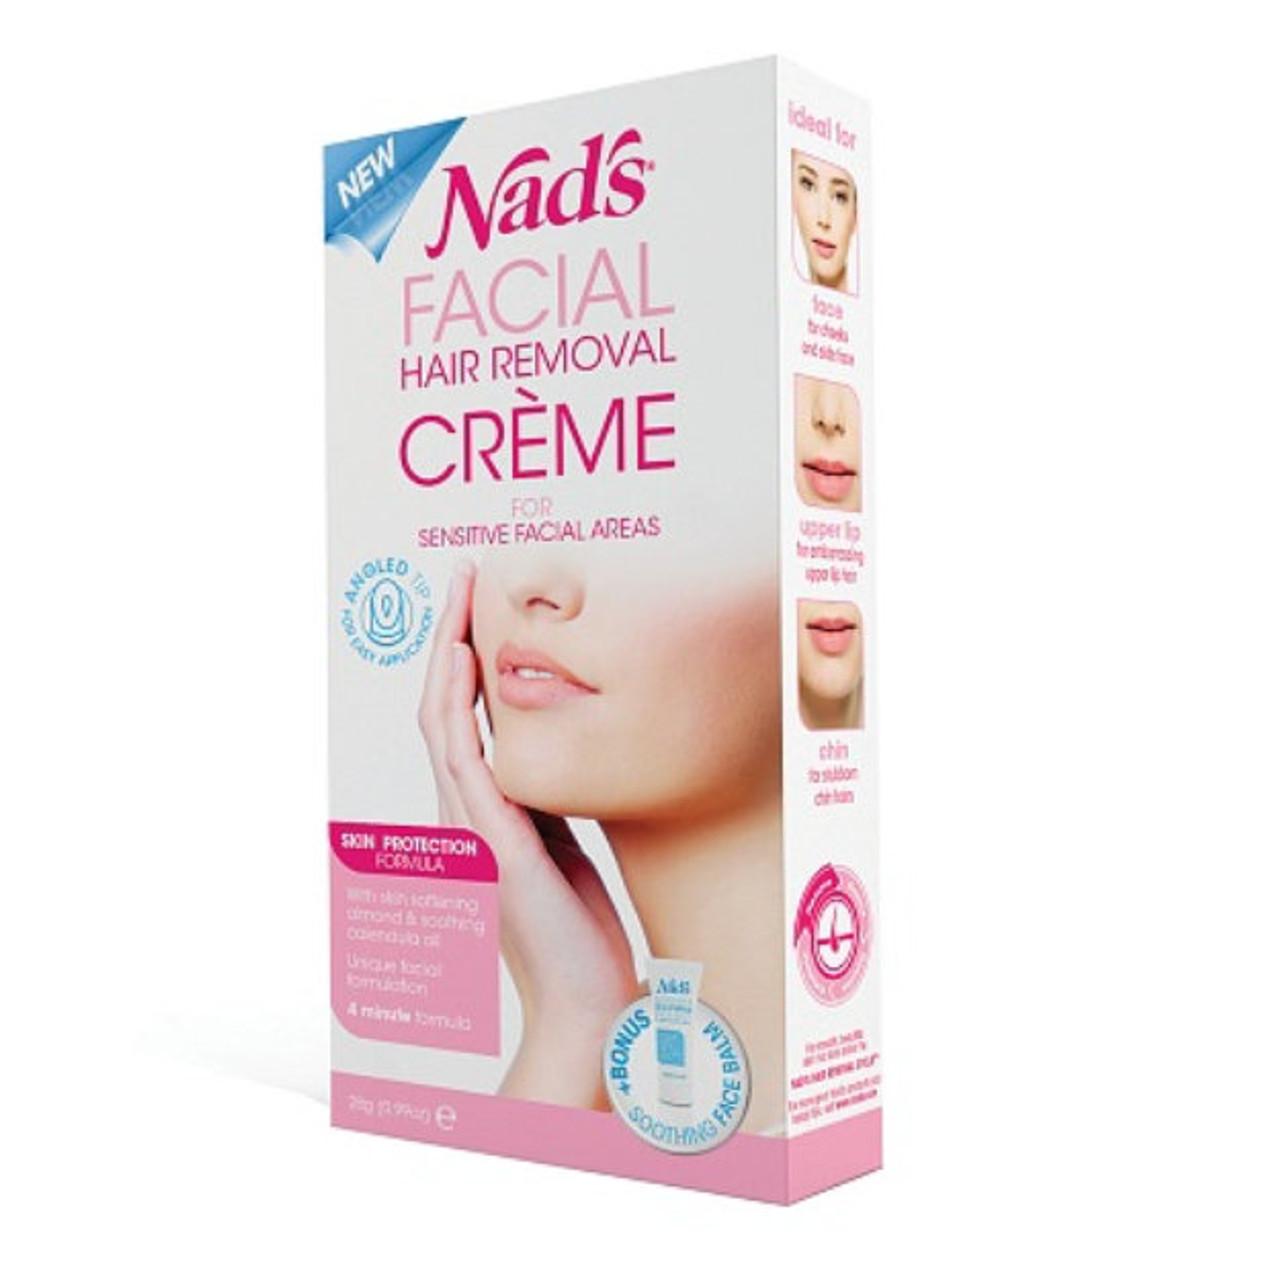 Nads Facial Hair Removal Creme Gentle Facial Formula 099 Oz